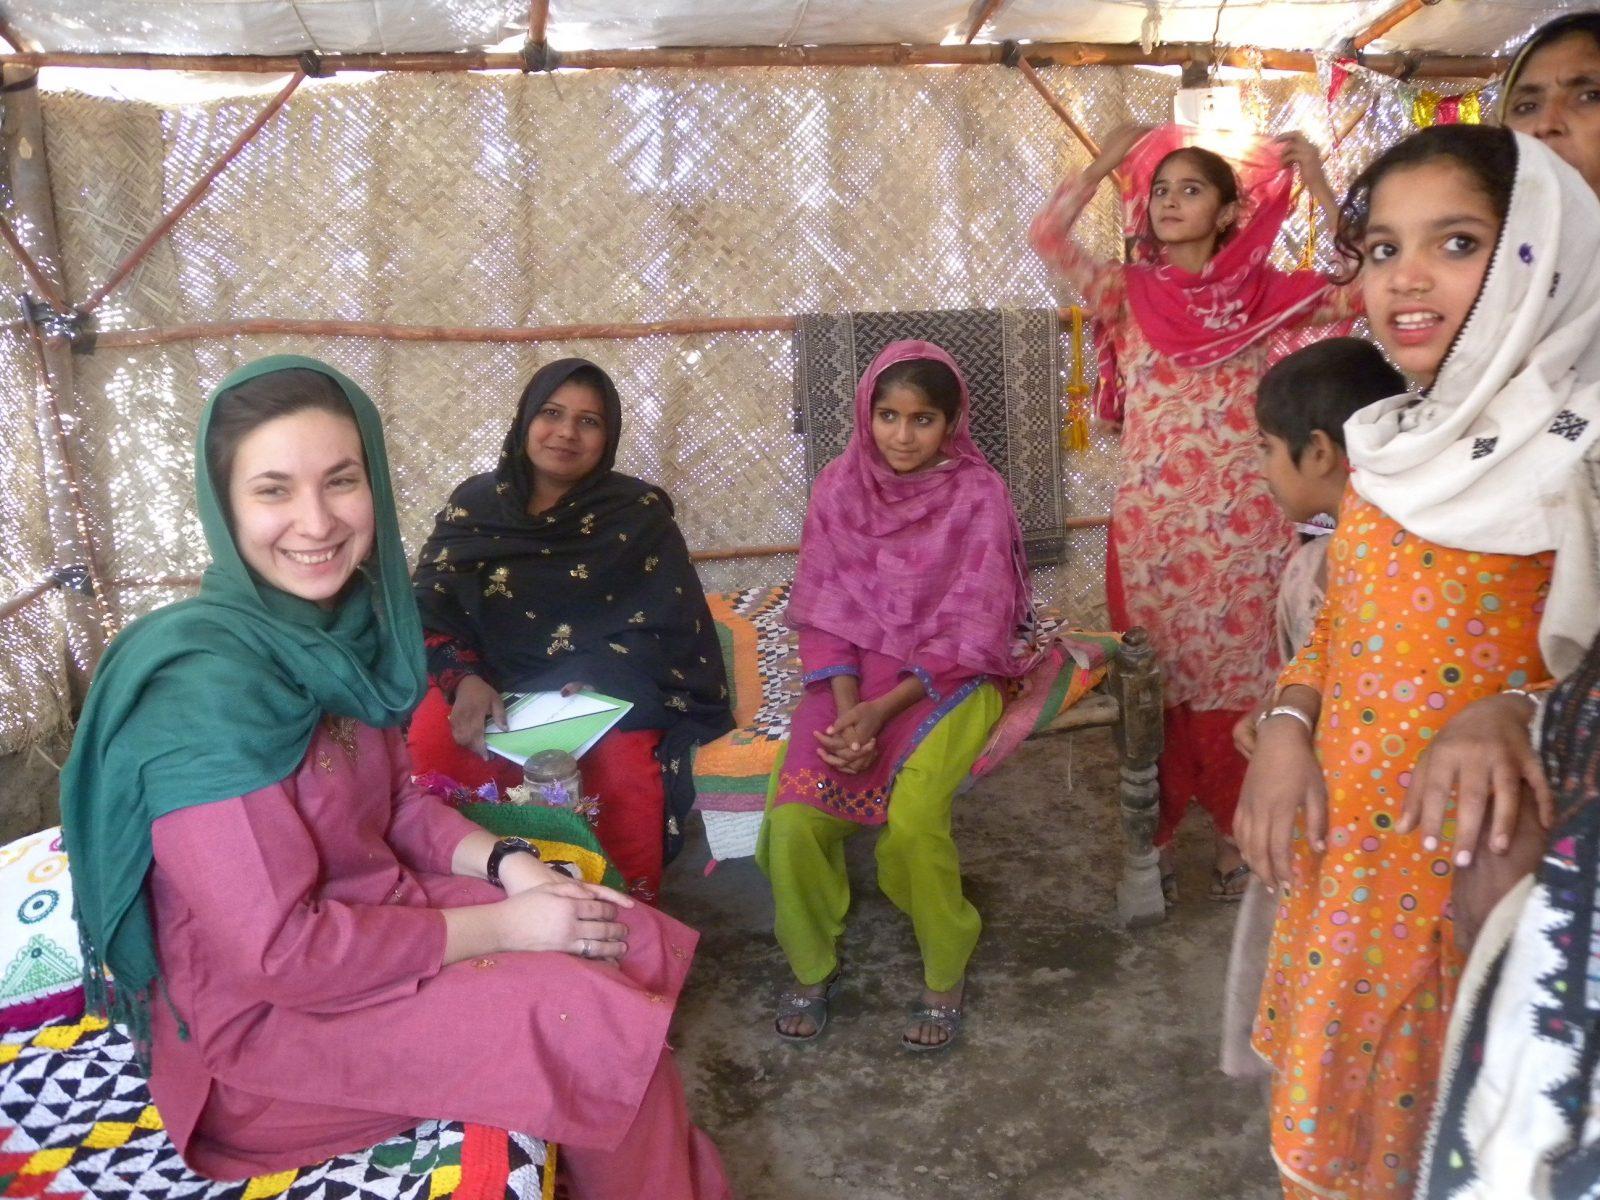 Pakistan 6 months after floods: Monica's story